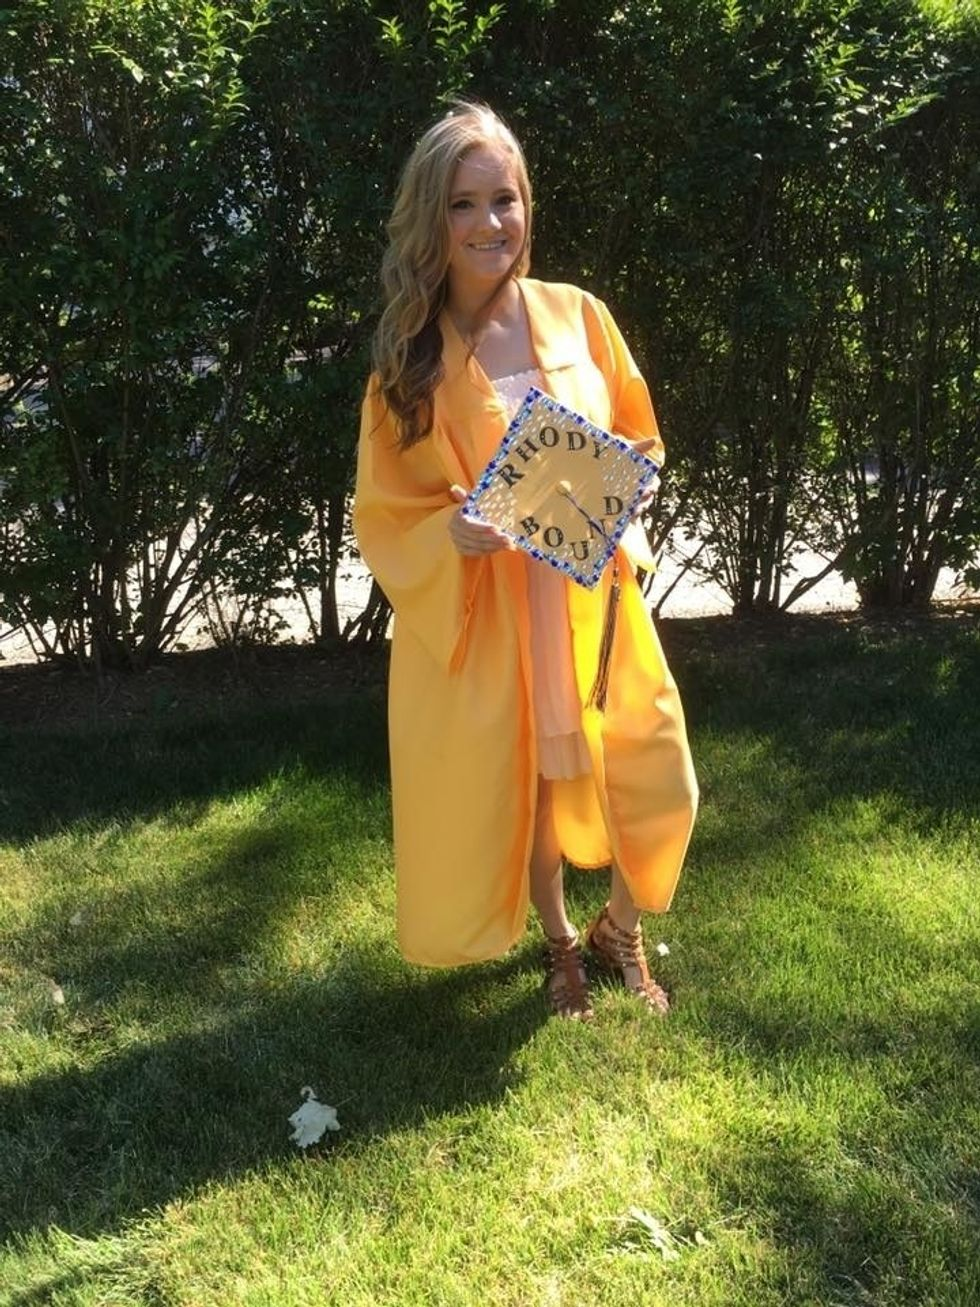 woman in high school graduation gown